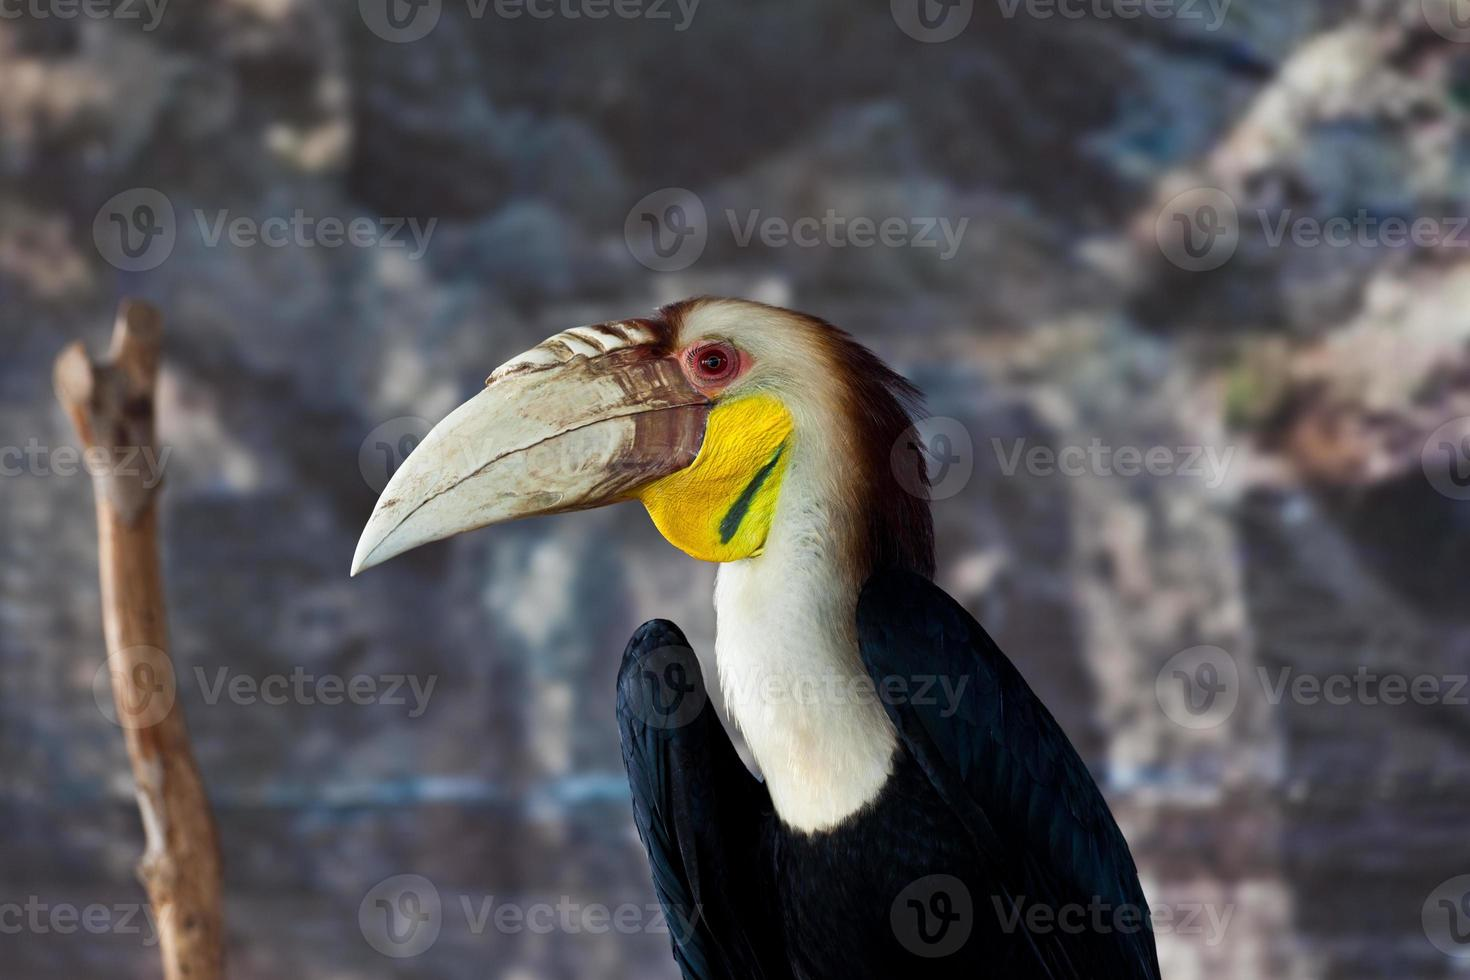 Wreathed hornbill, bird photo